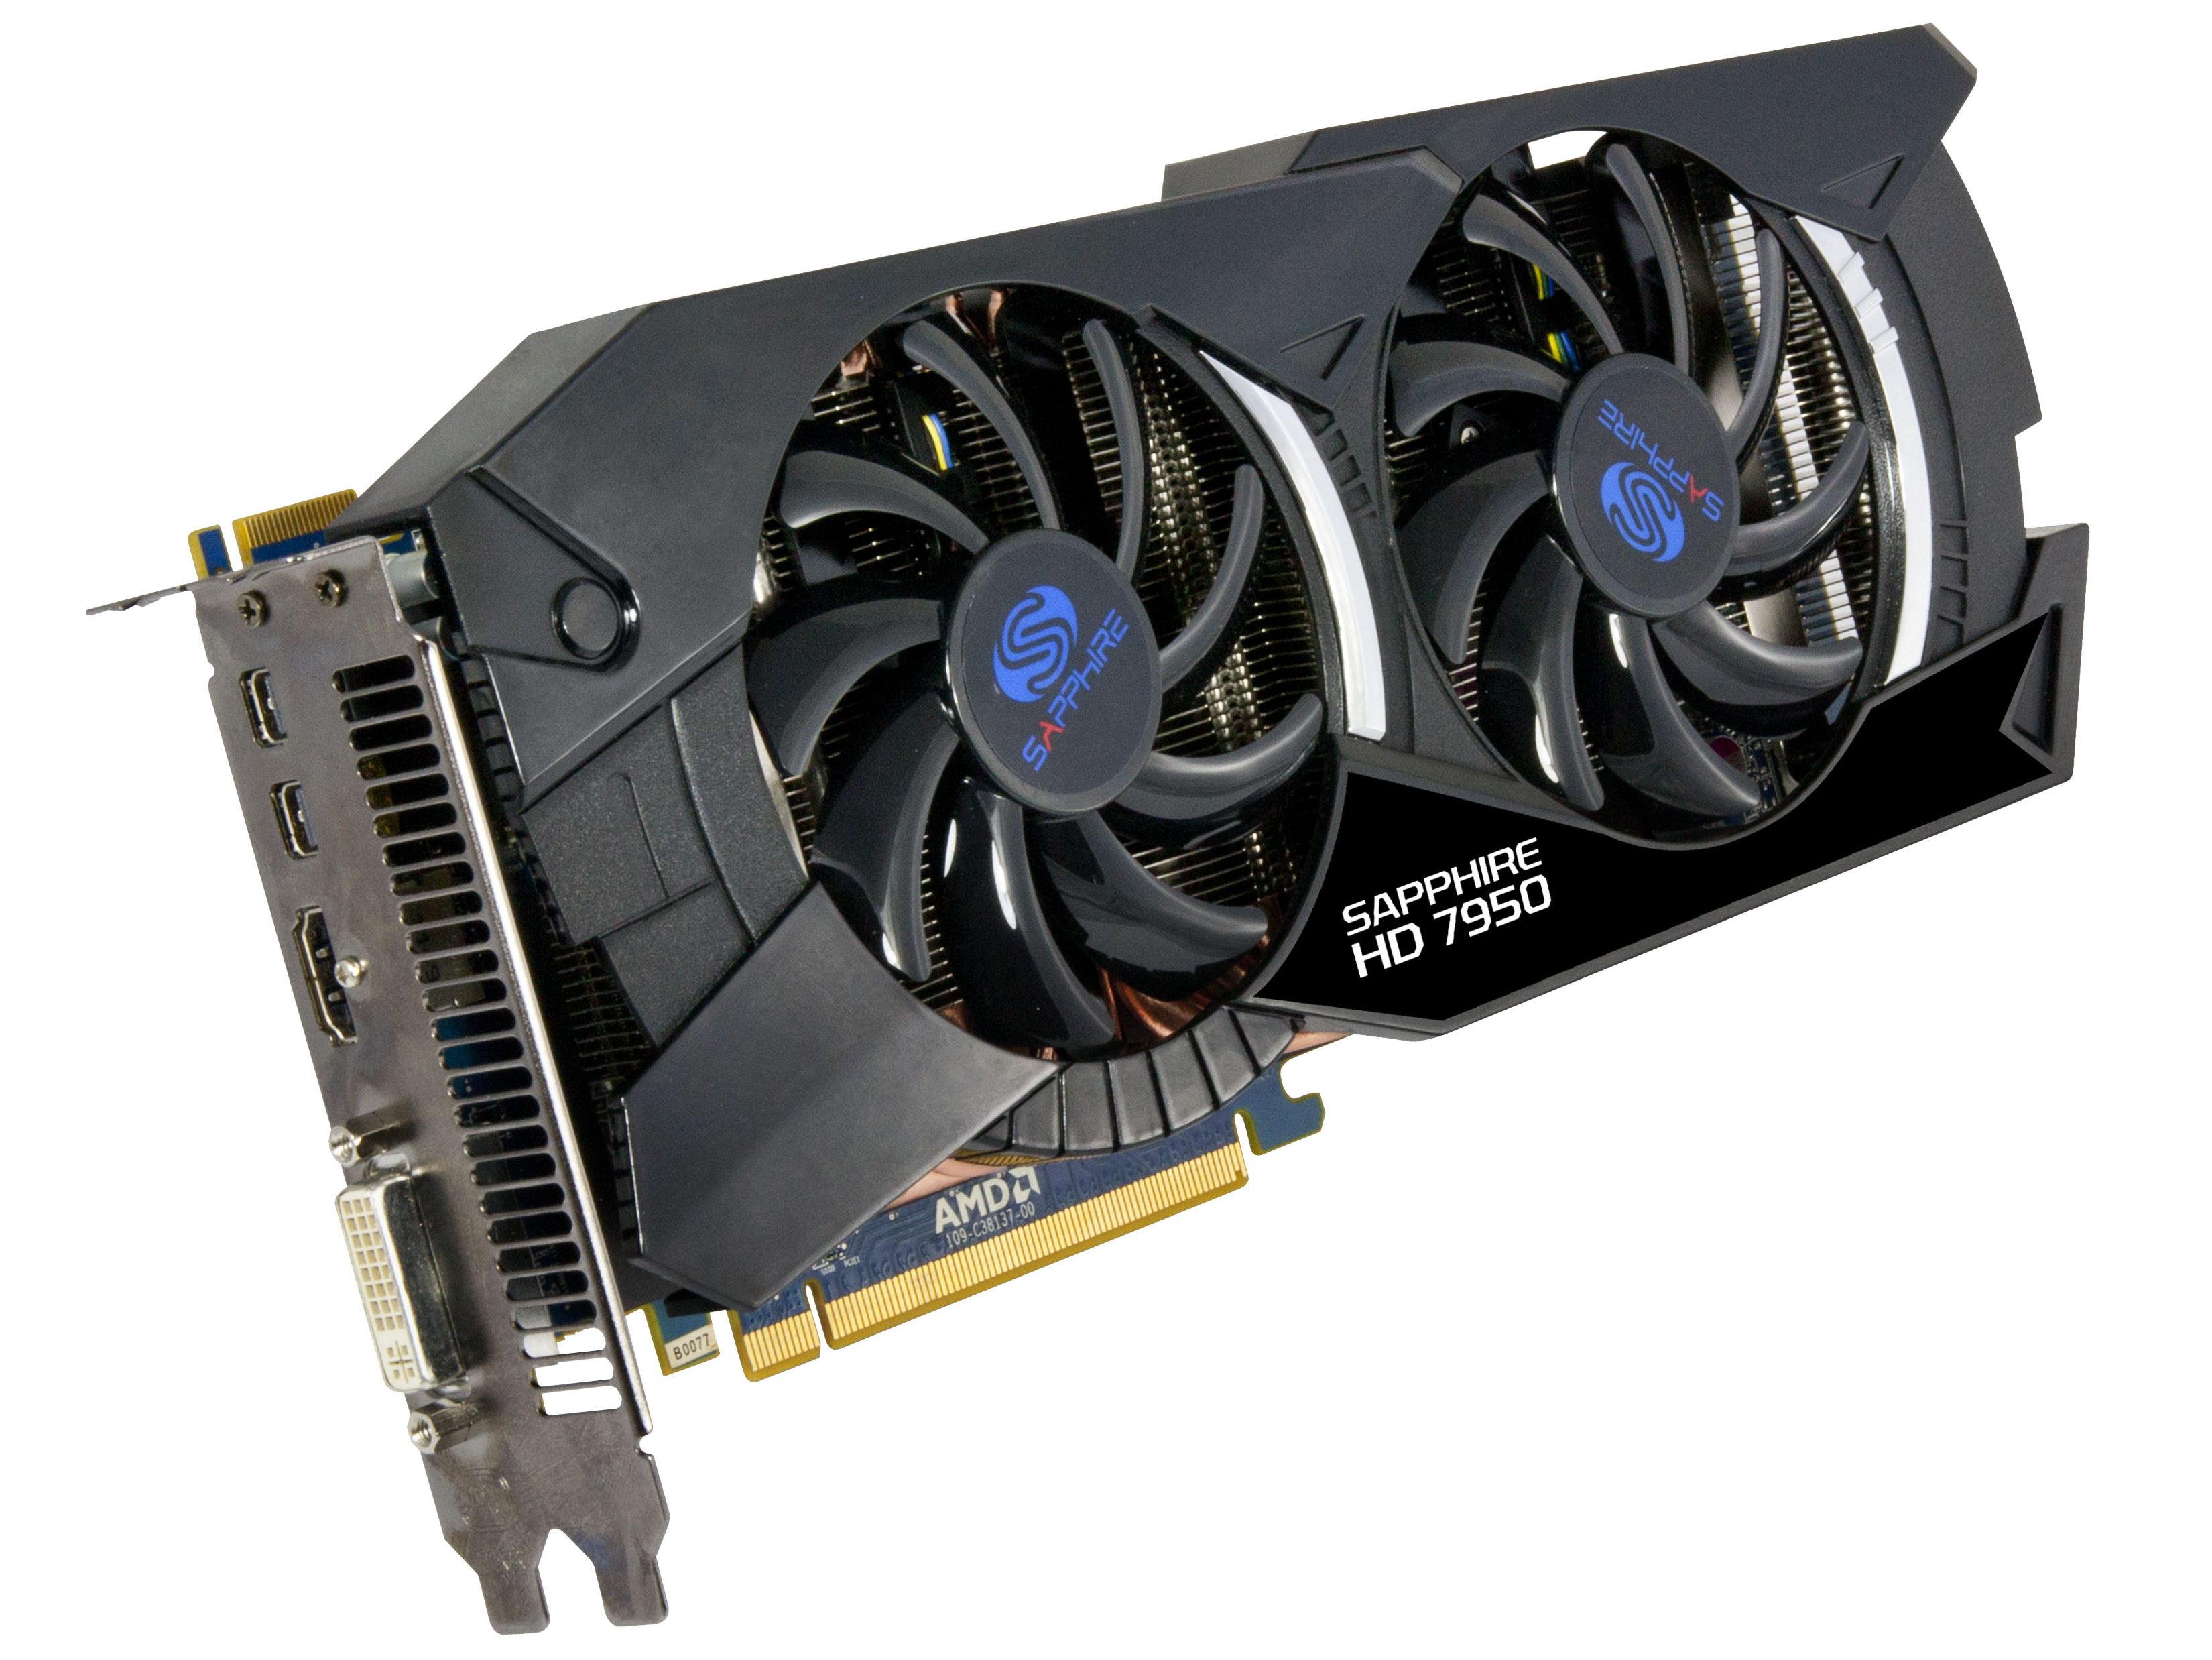 Sapphire Radeon HD 7950 OverClock Edition | TechRadar